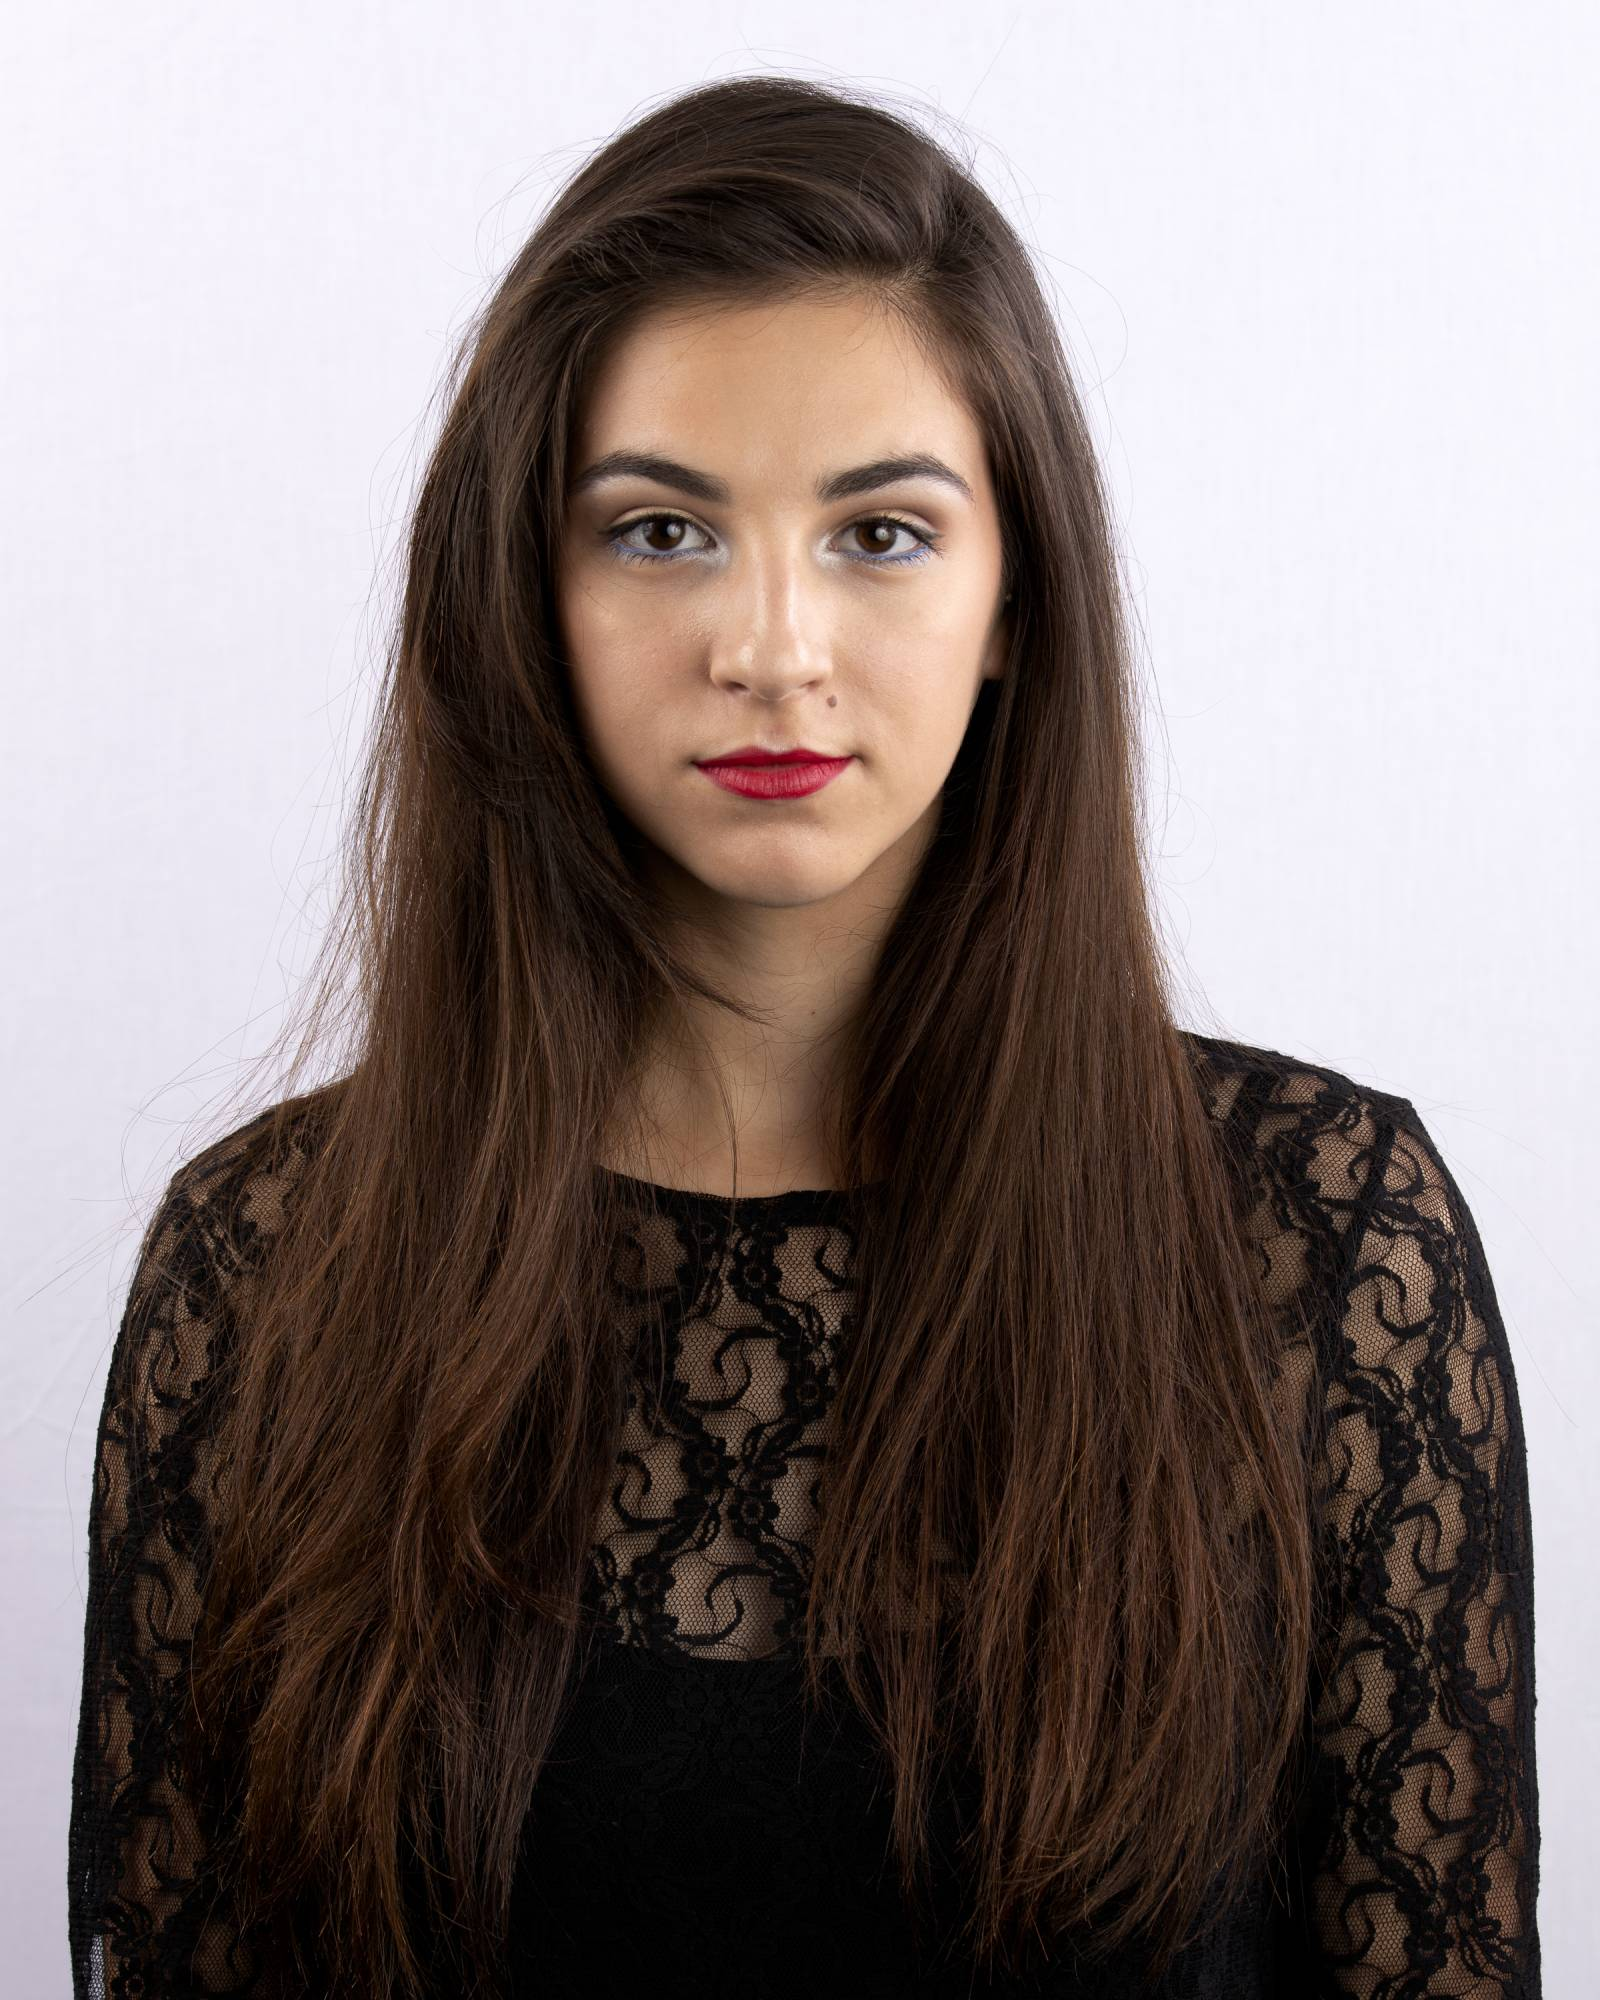 Talent #231,Age 18,Rochester